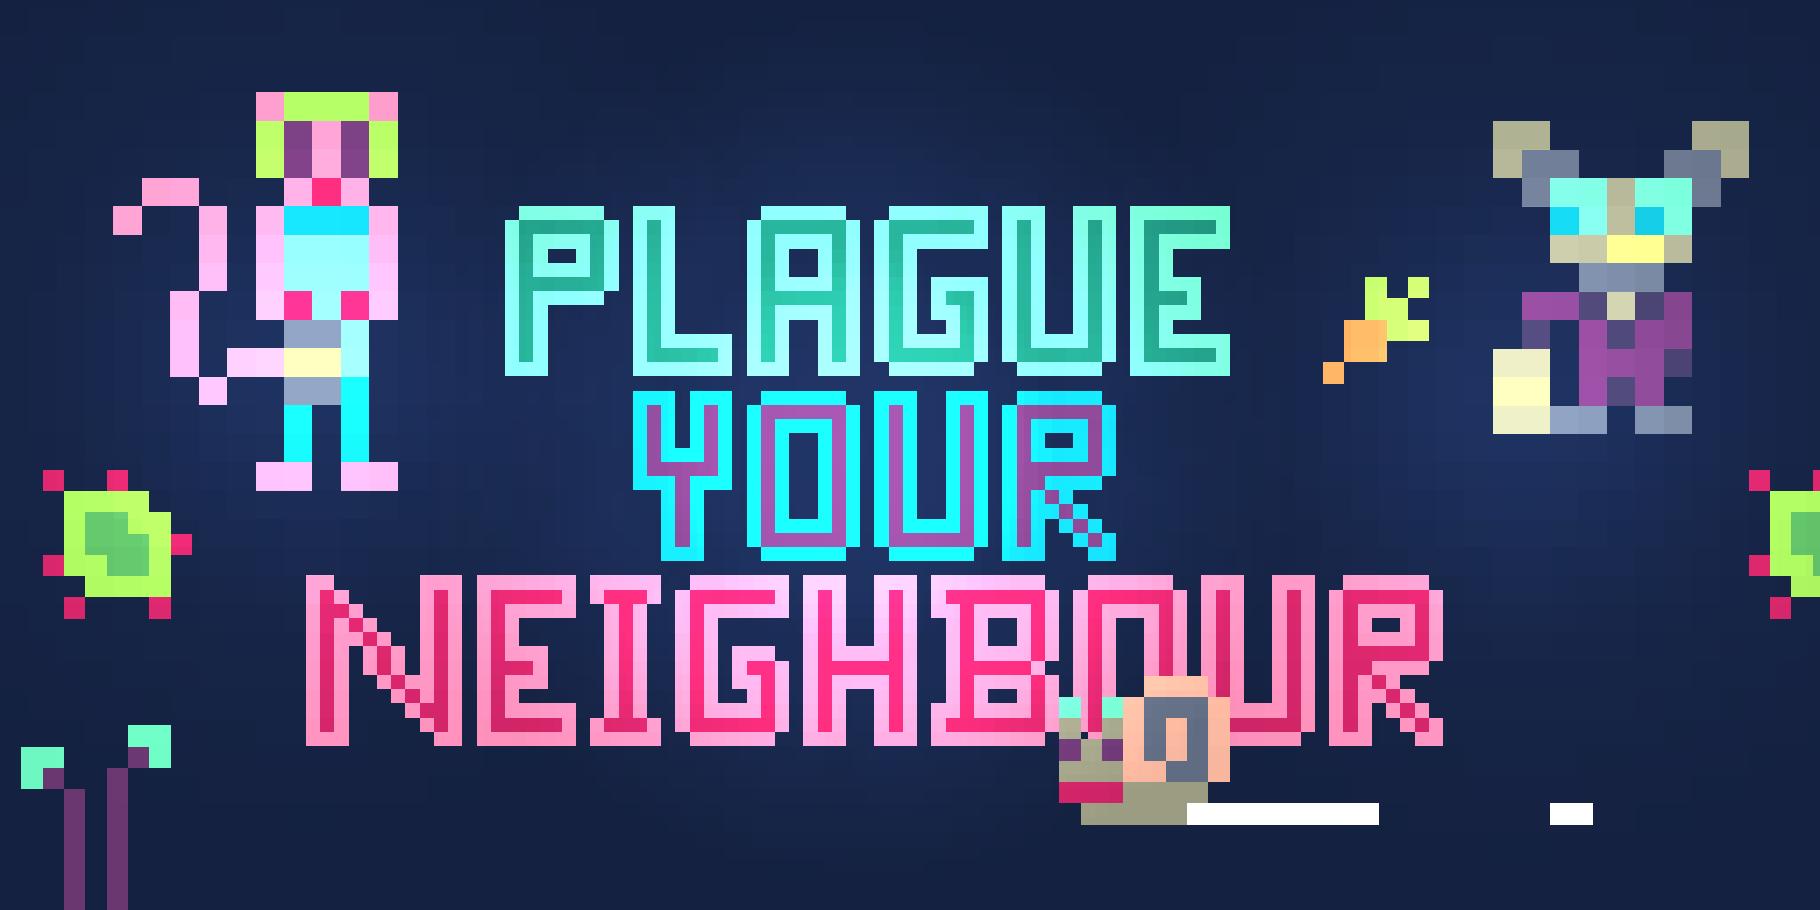 Plague Your Neighbour